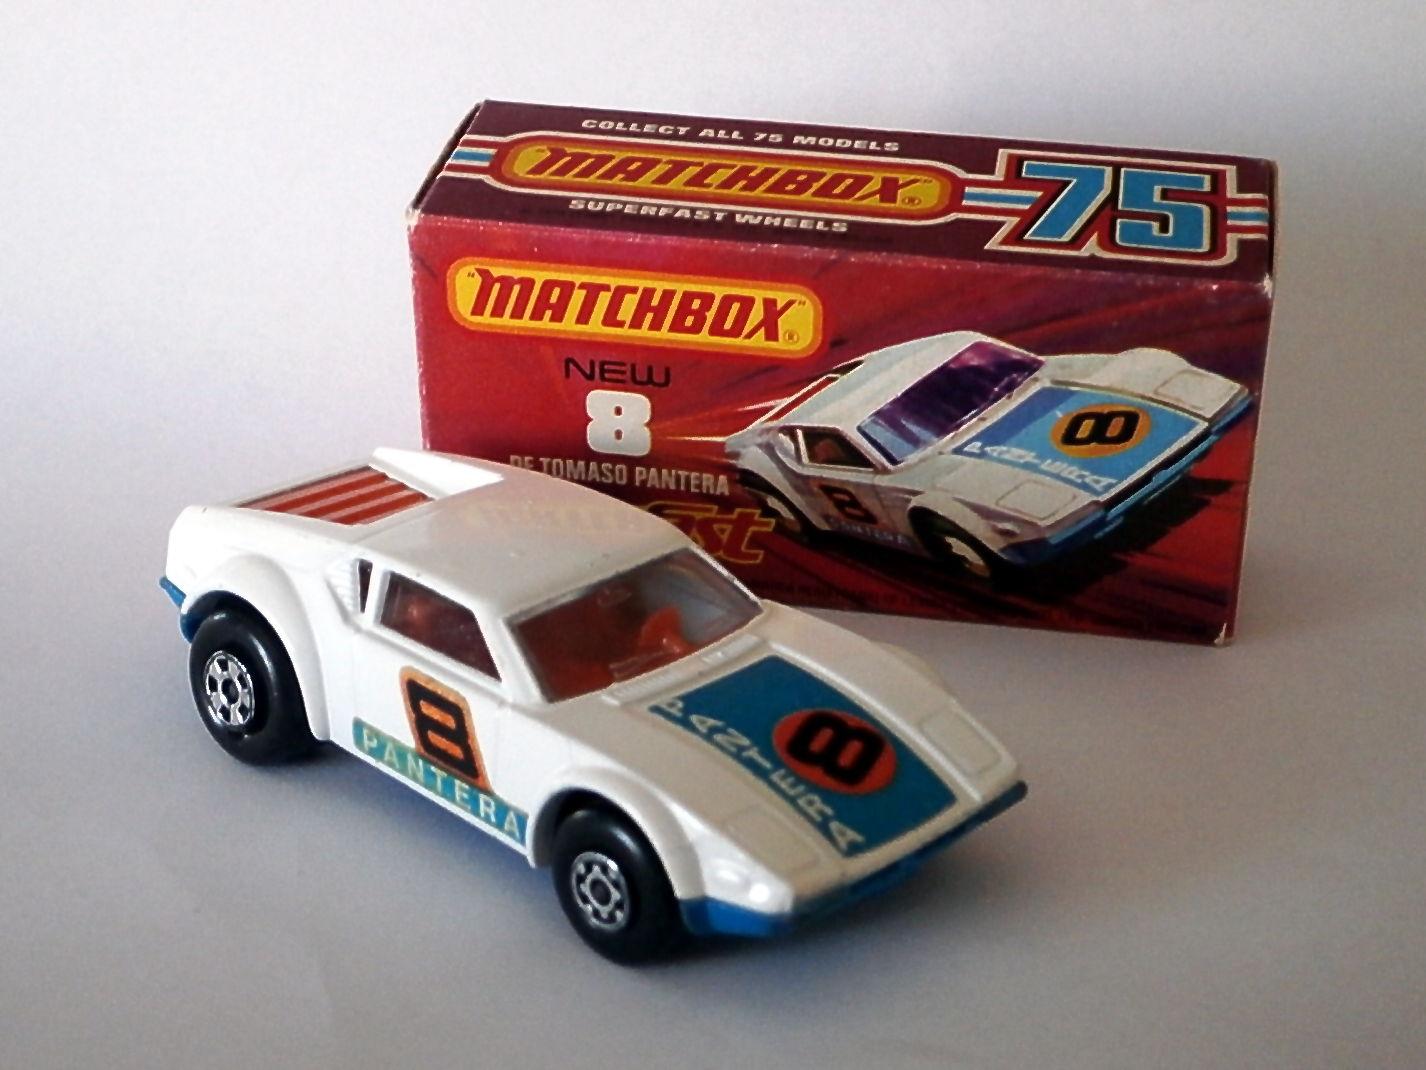 Category 1980 Matchbox Matchbox Cars Wiki Fandom